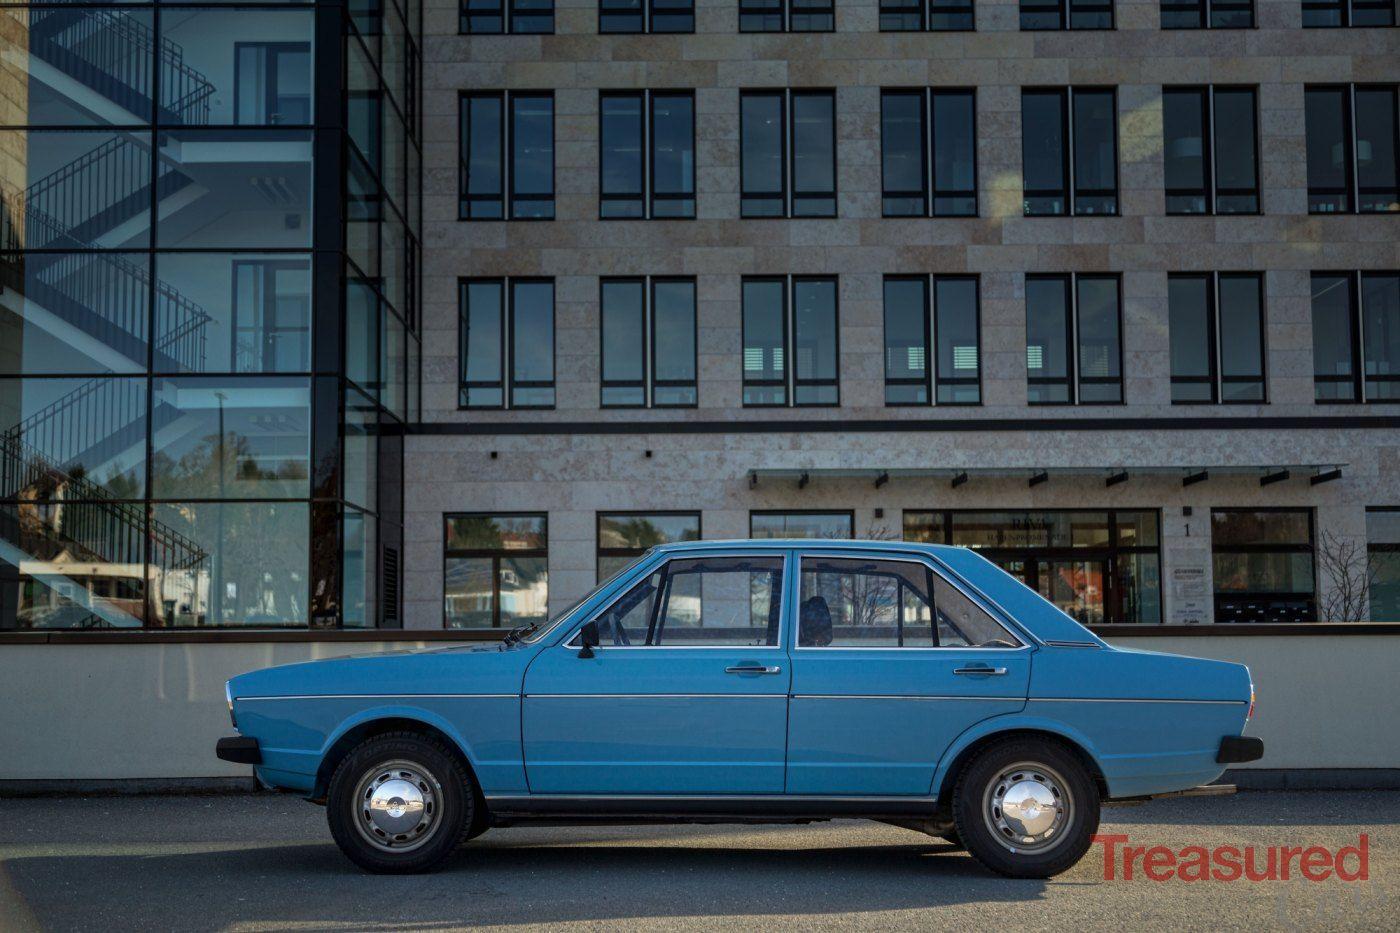 Audi 80 1976  treasuredcars com  audi_80-1976-20201107030259-6